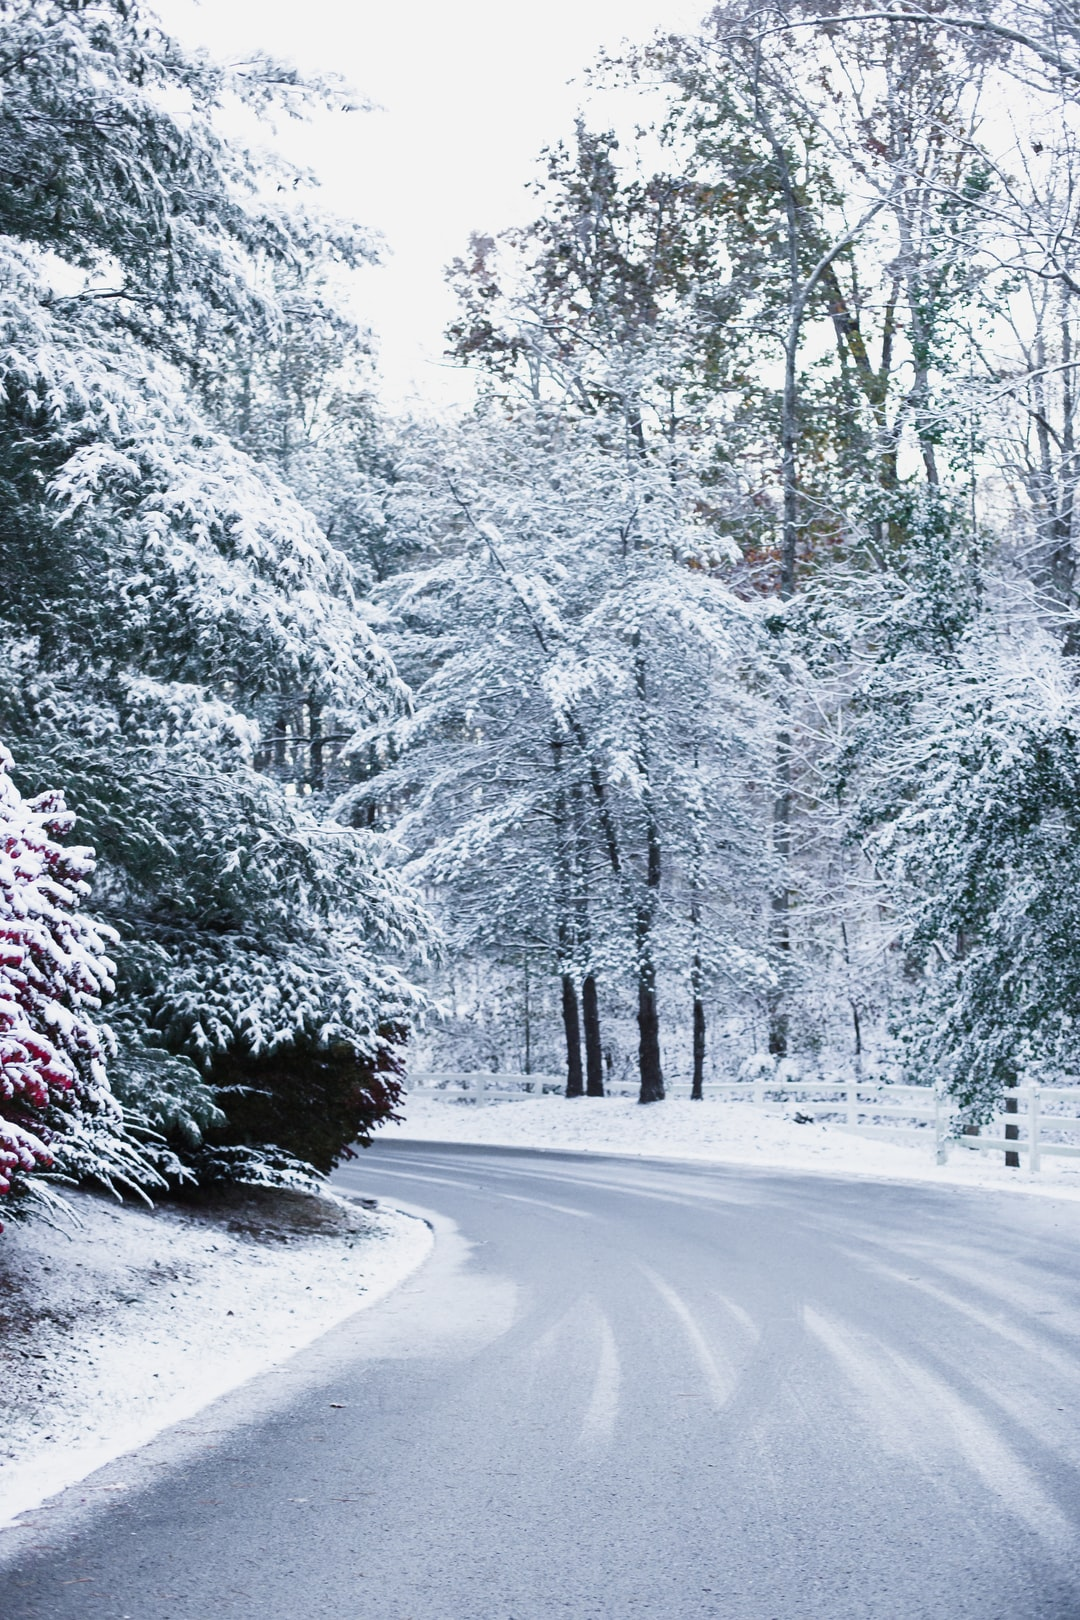 Winter wonderland in Kentucky.